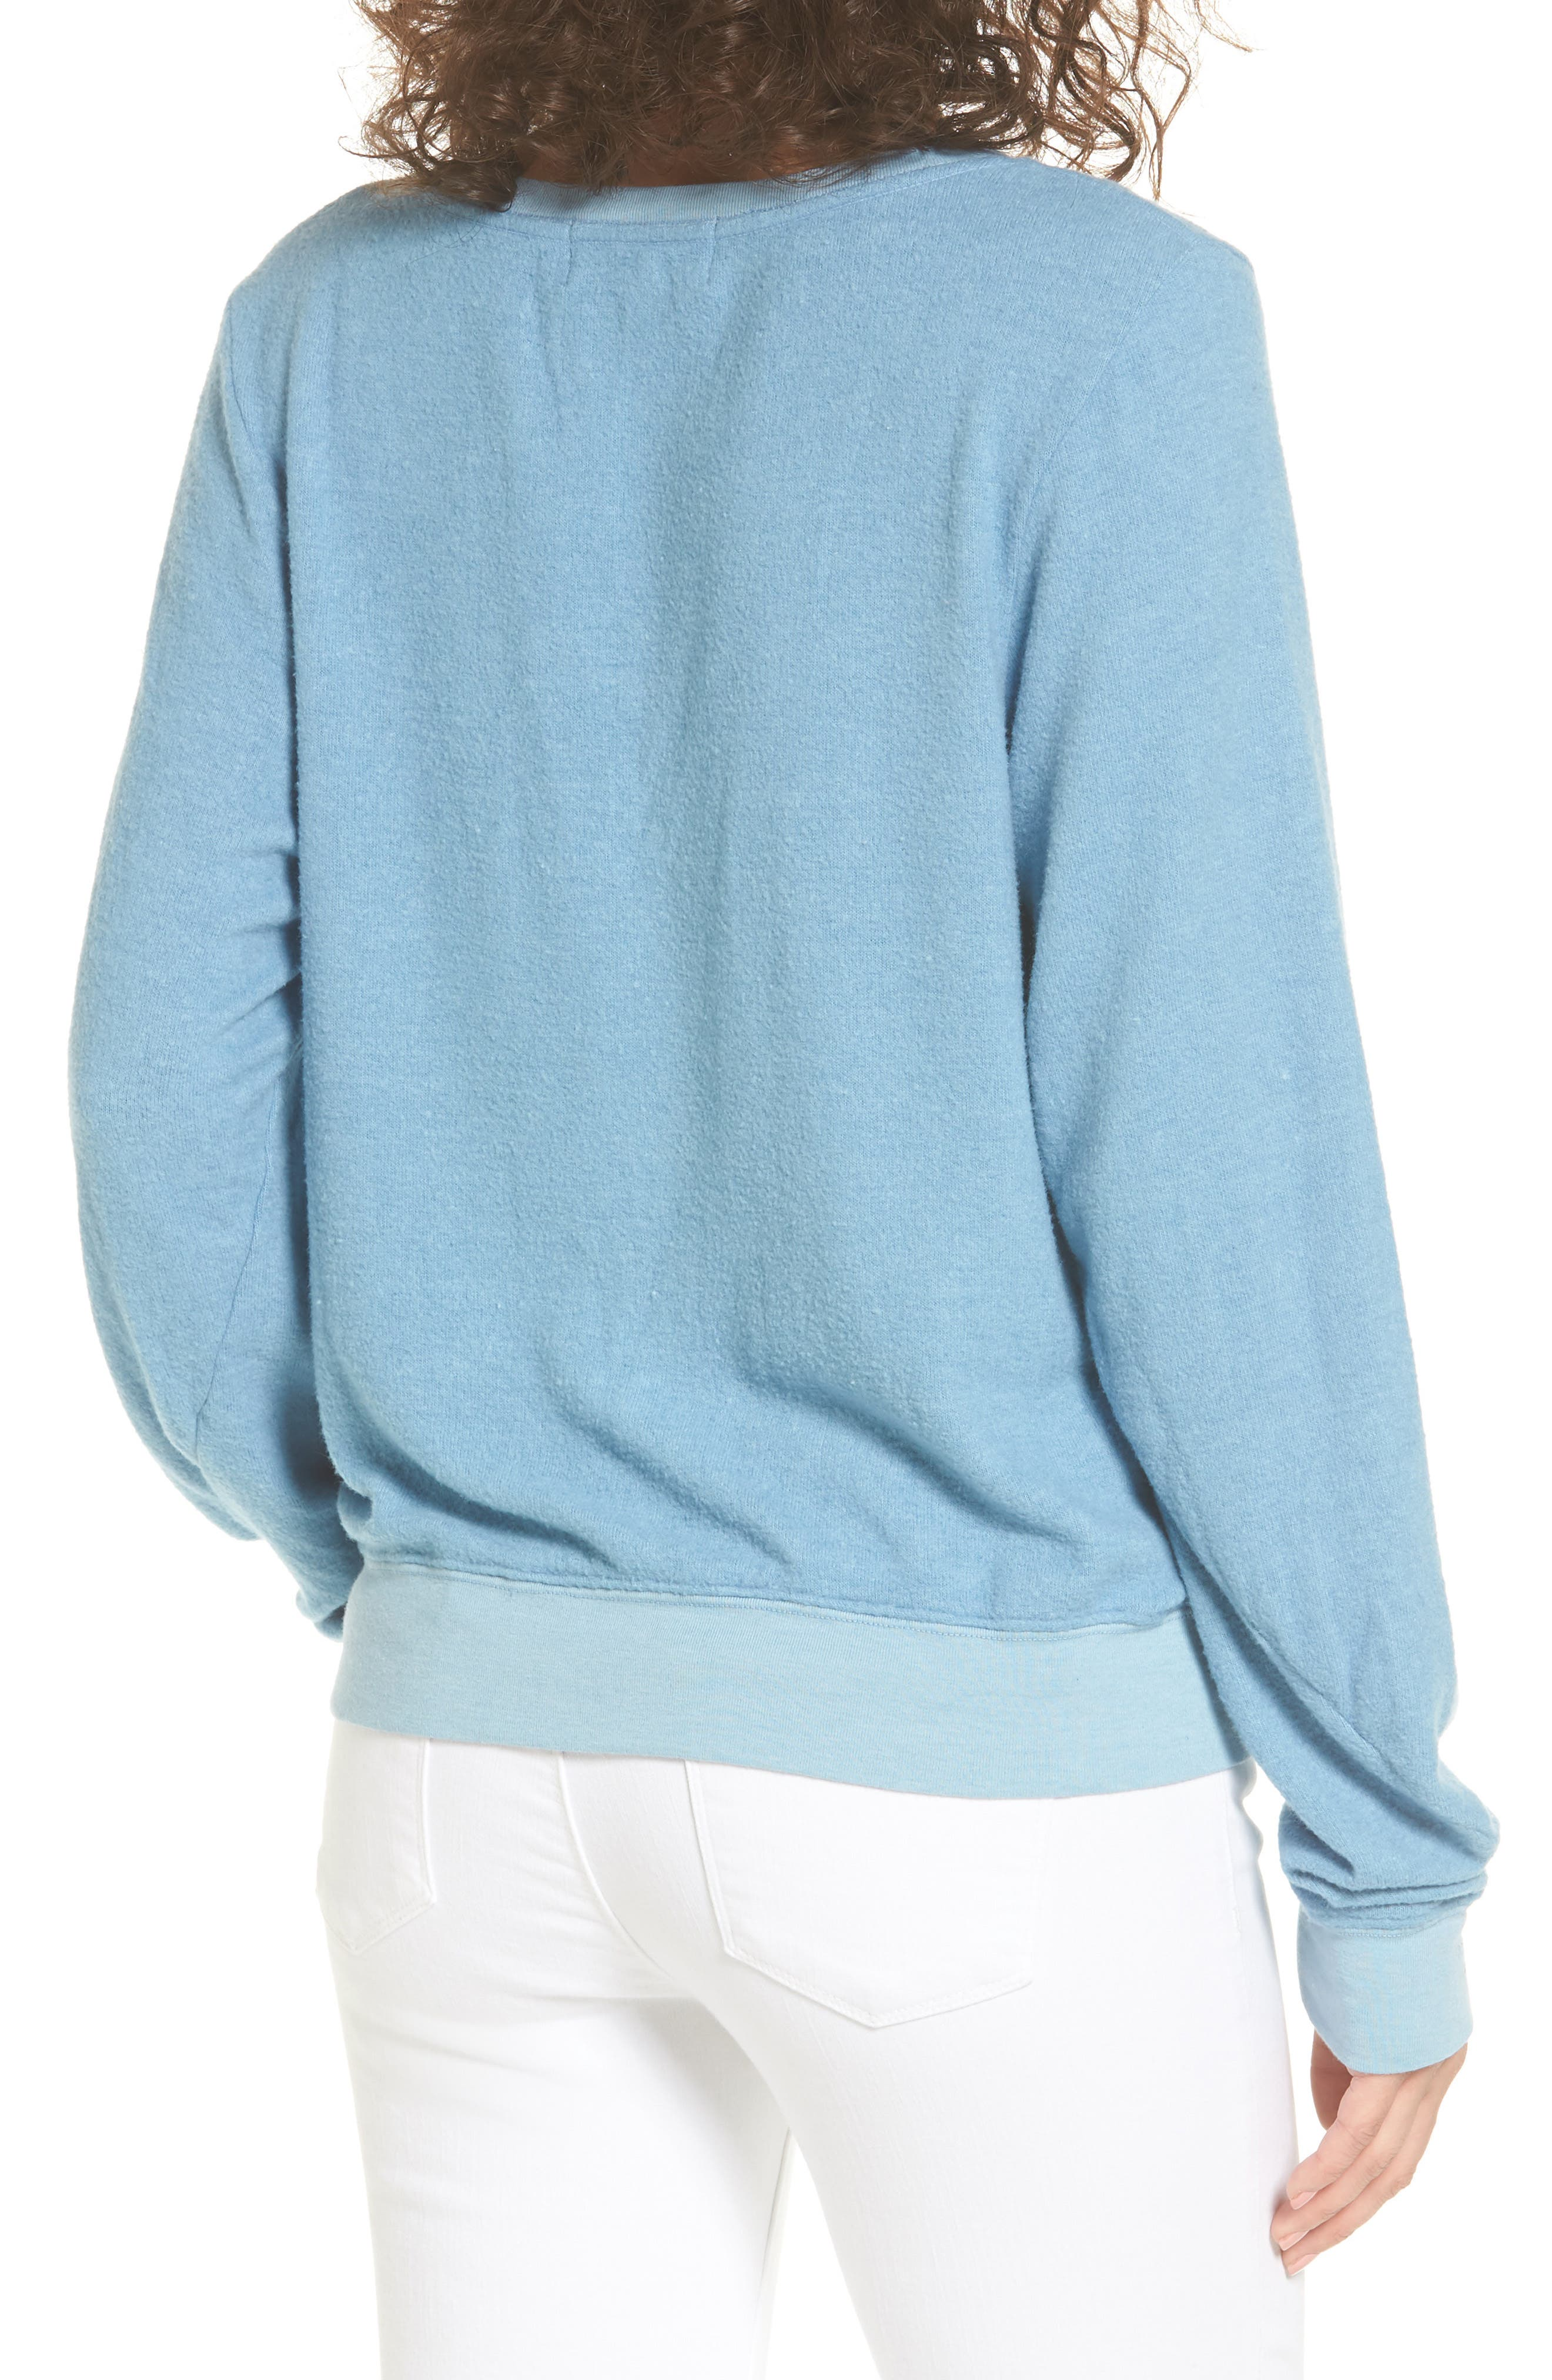 Shopping is My Cardio Sweatshirt,                             Alternate thumbnail 2, color,                             400